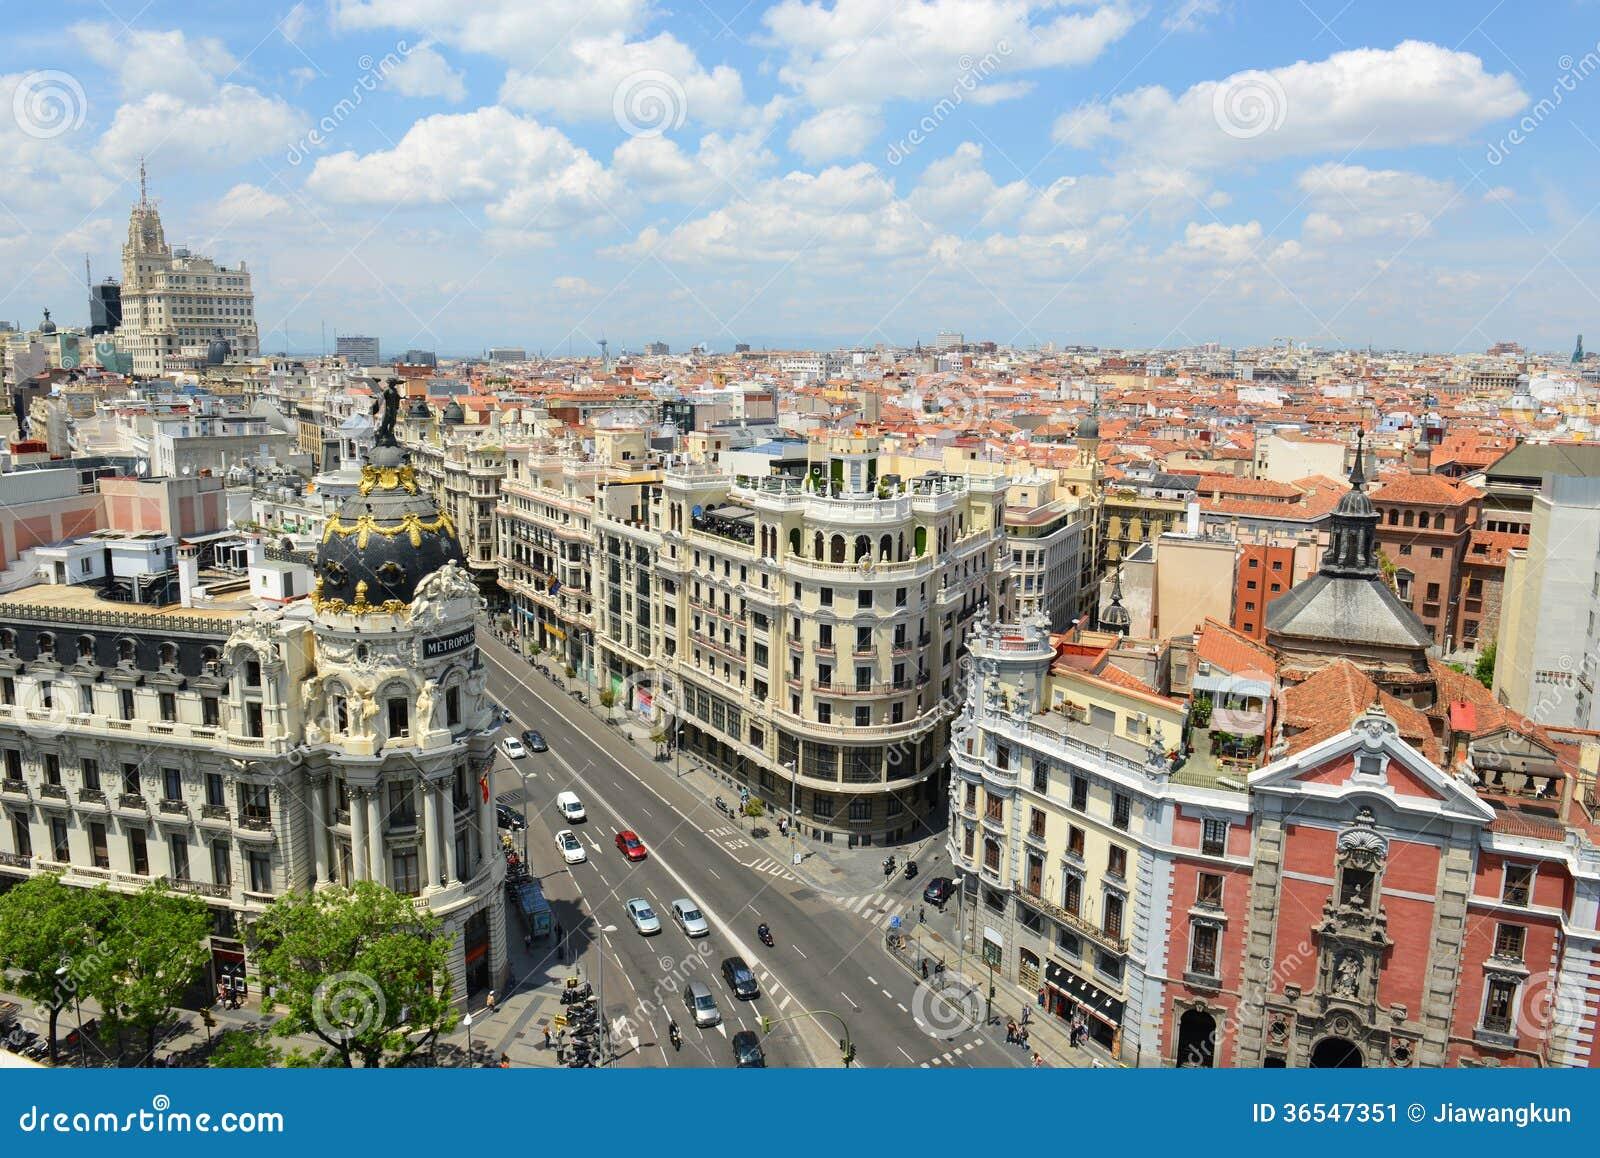 madrid stadt skyline spanien stockbild bild 36547351. Black Bedroom Furniture Sets. Home Design Ideas